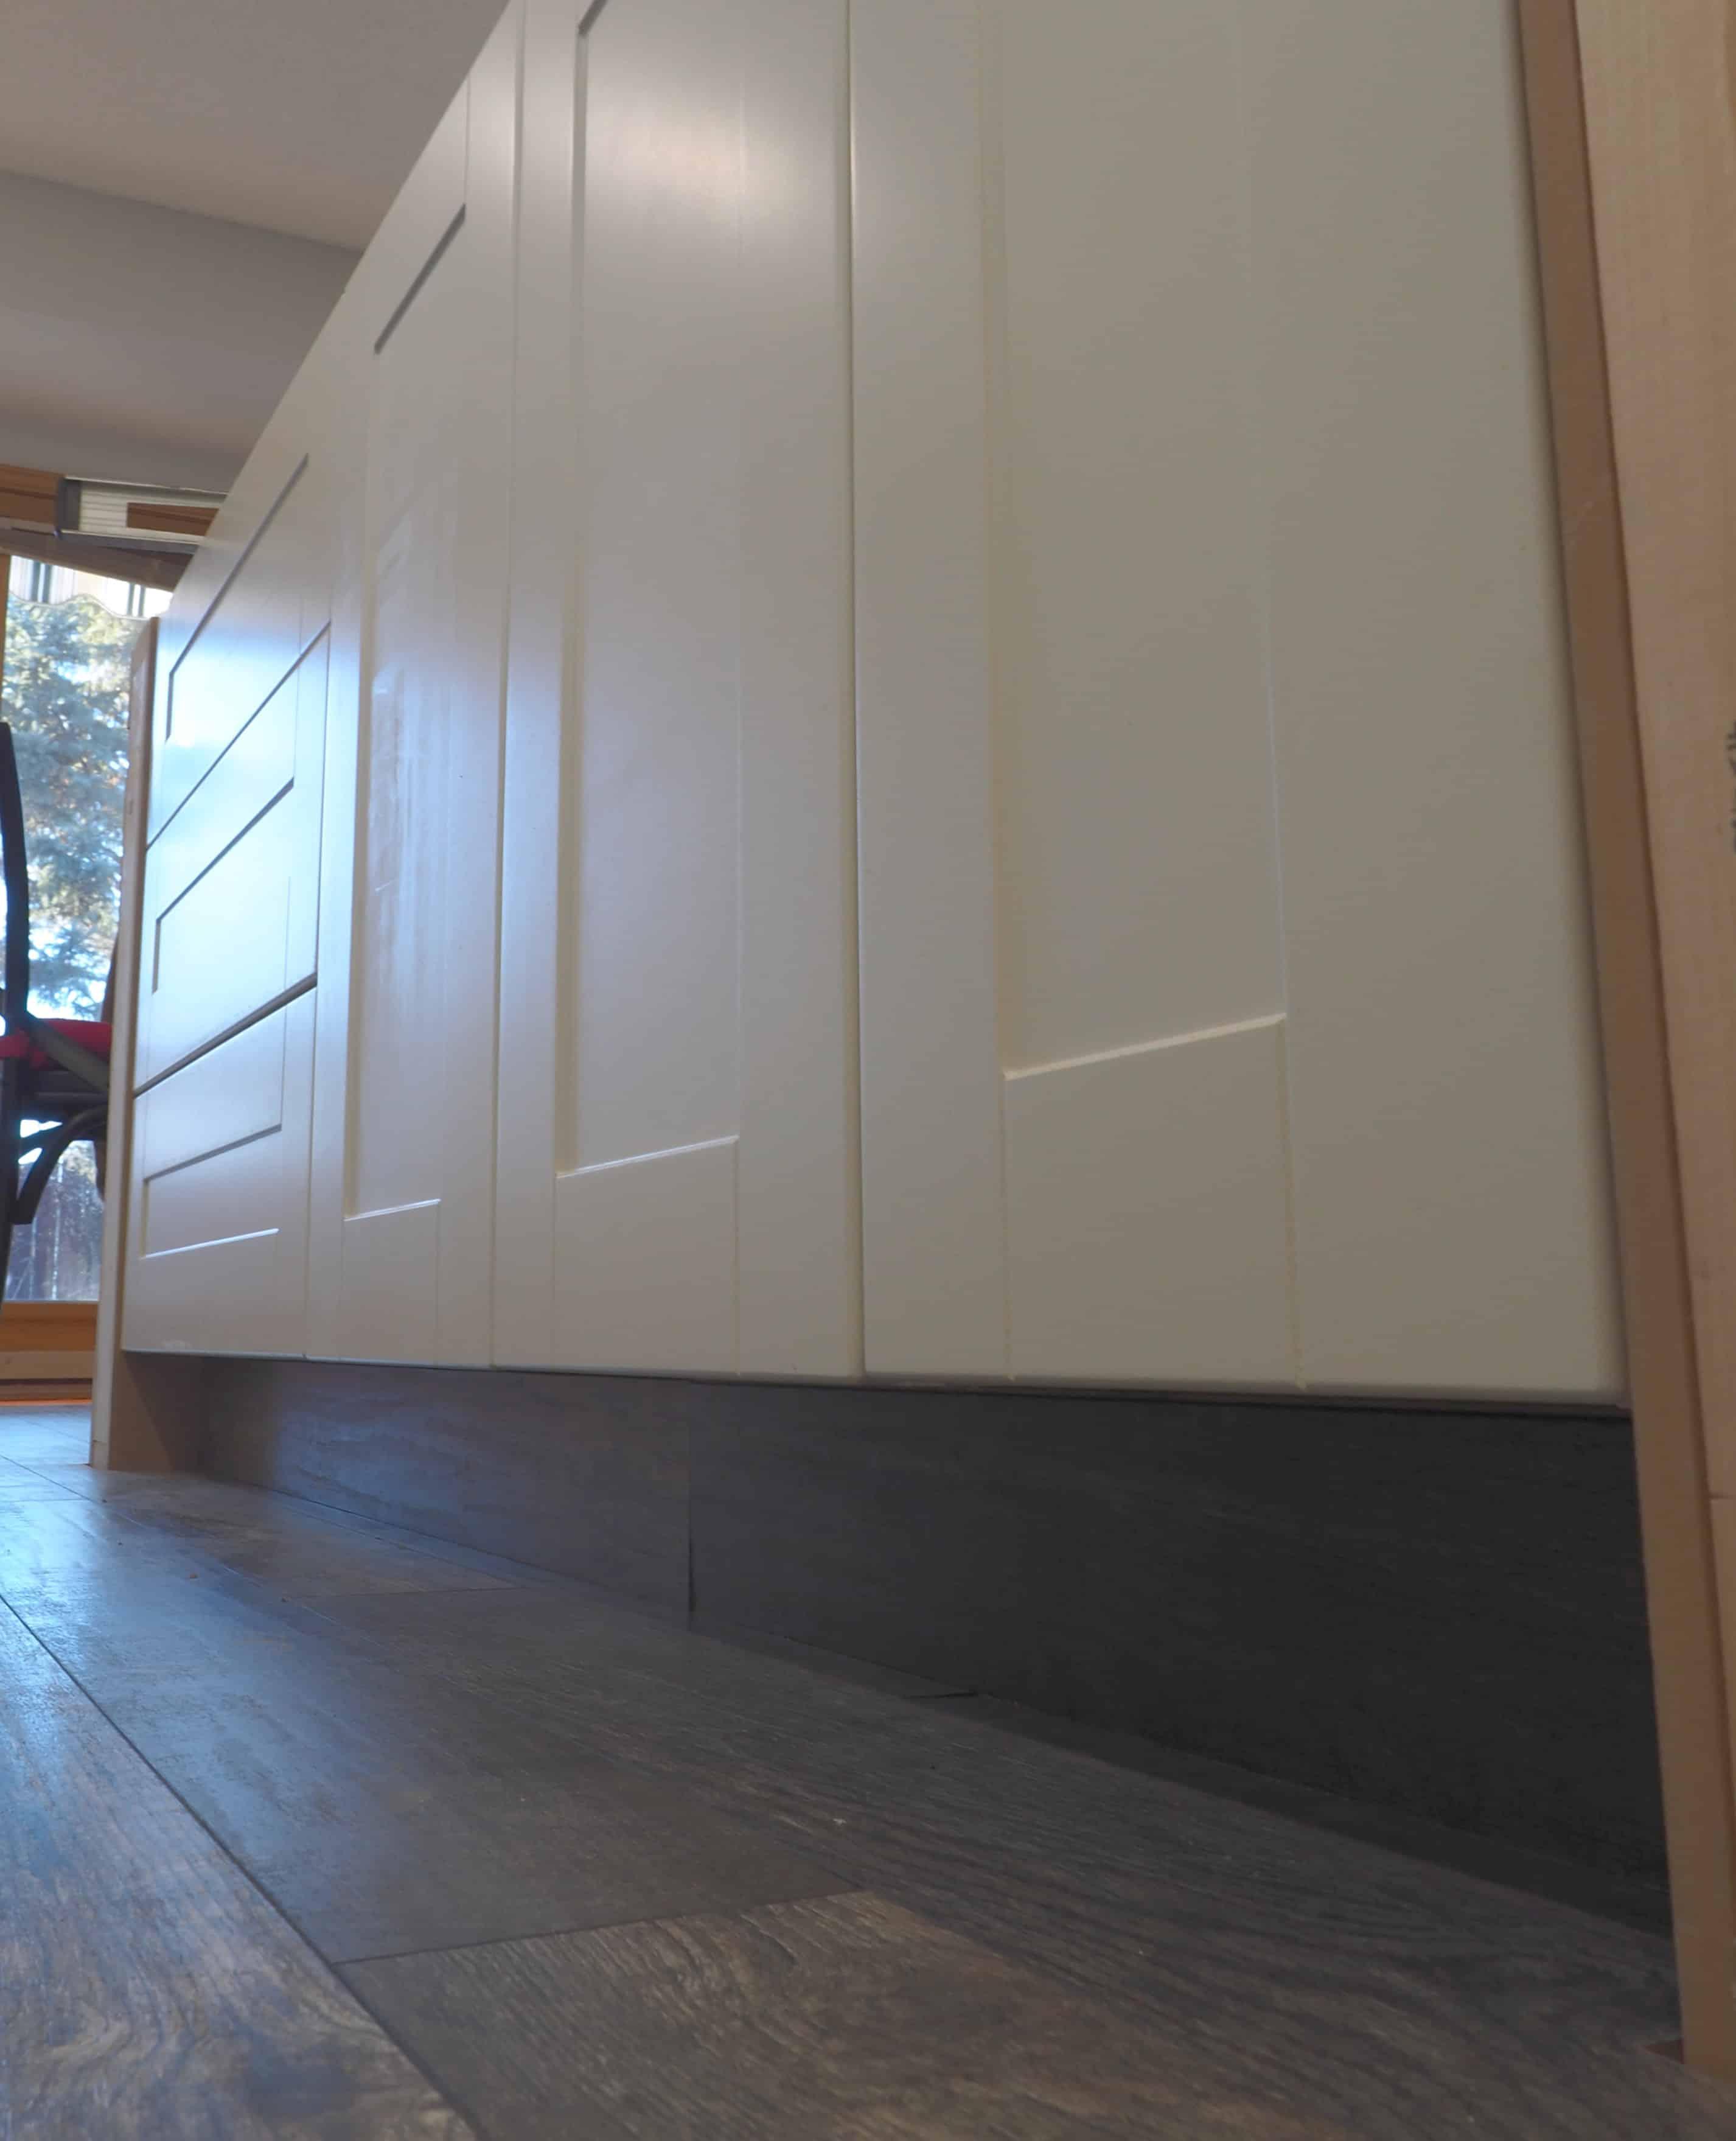 Ikea Kitchen Cabinets 2017: Kitchen Update- IKEA Cabinet Installation (Chapter #2